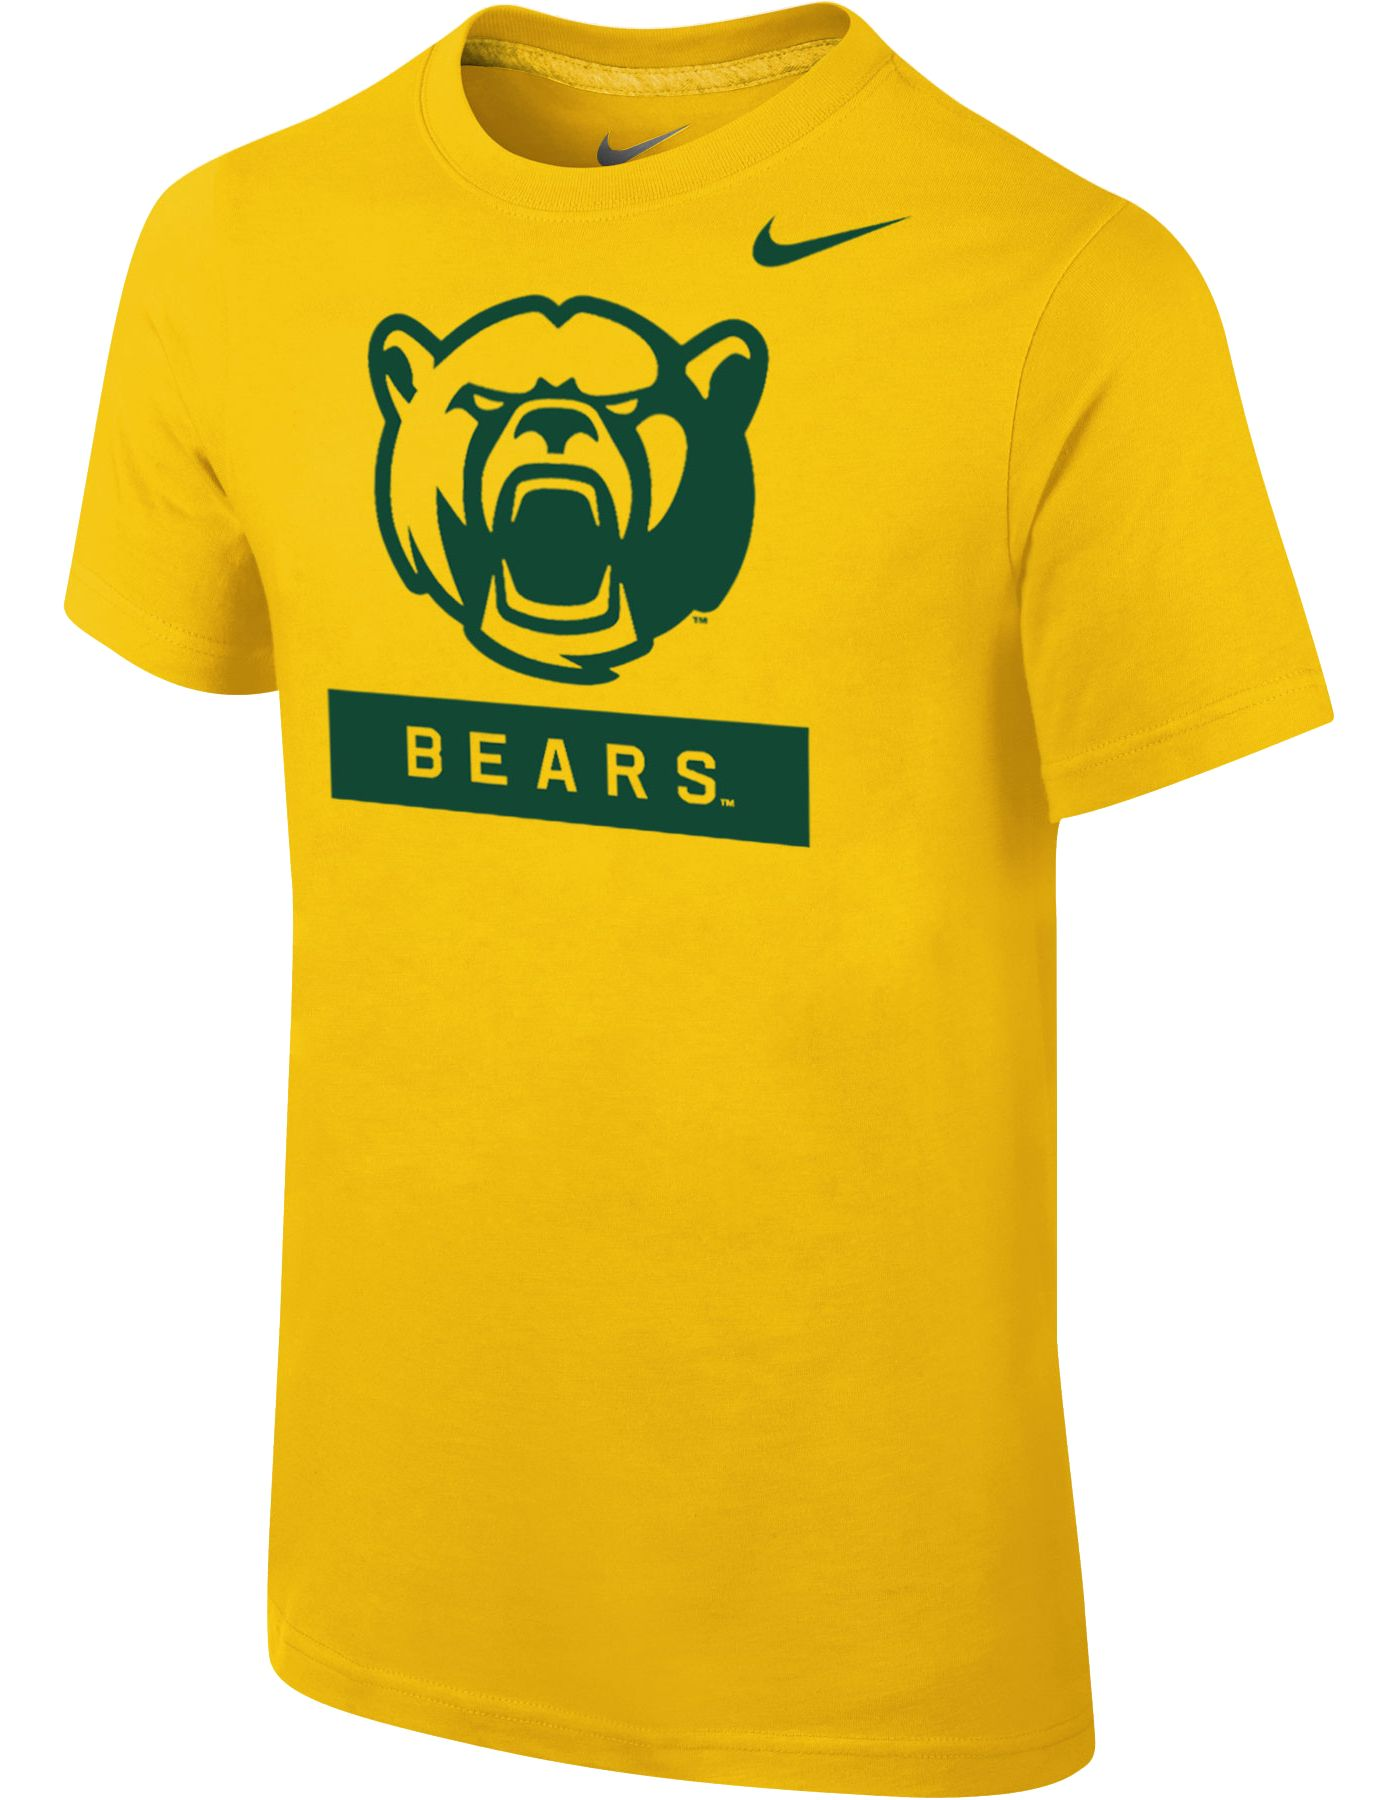 Nike Youth Baylor Bears Gold Core Cotton T-Shirt